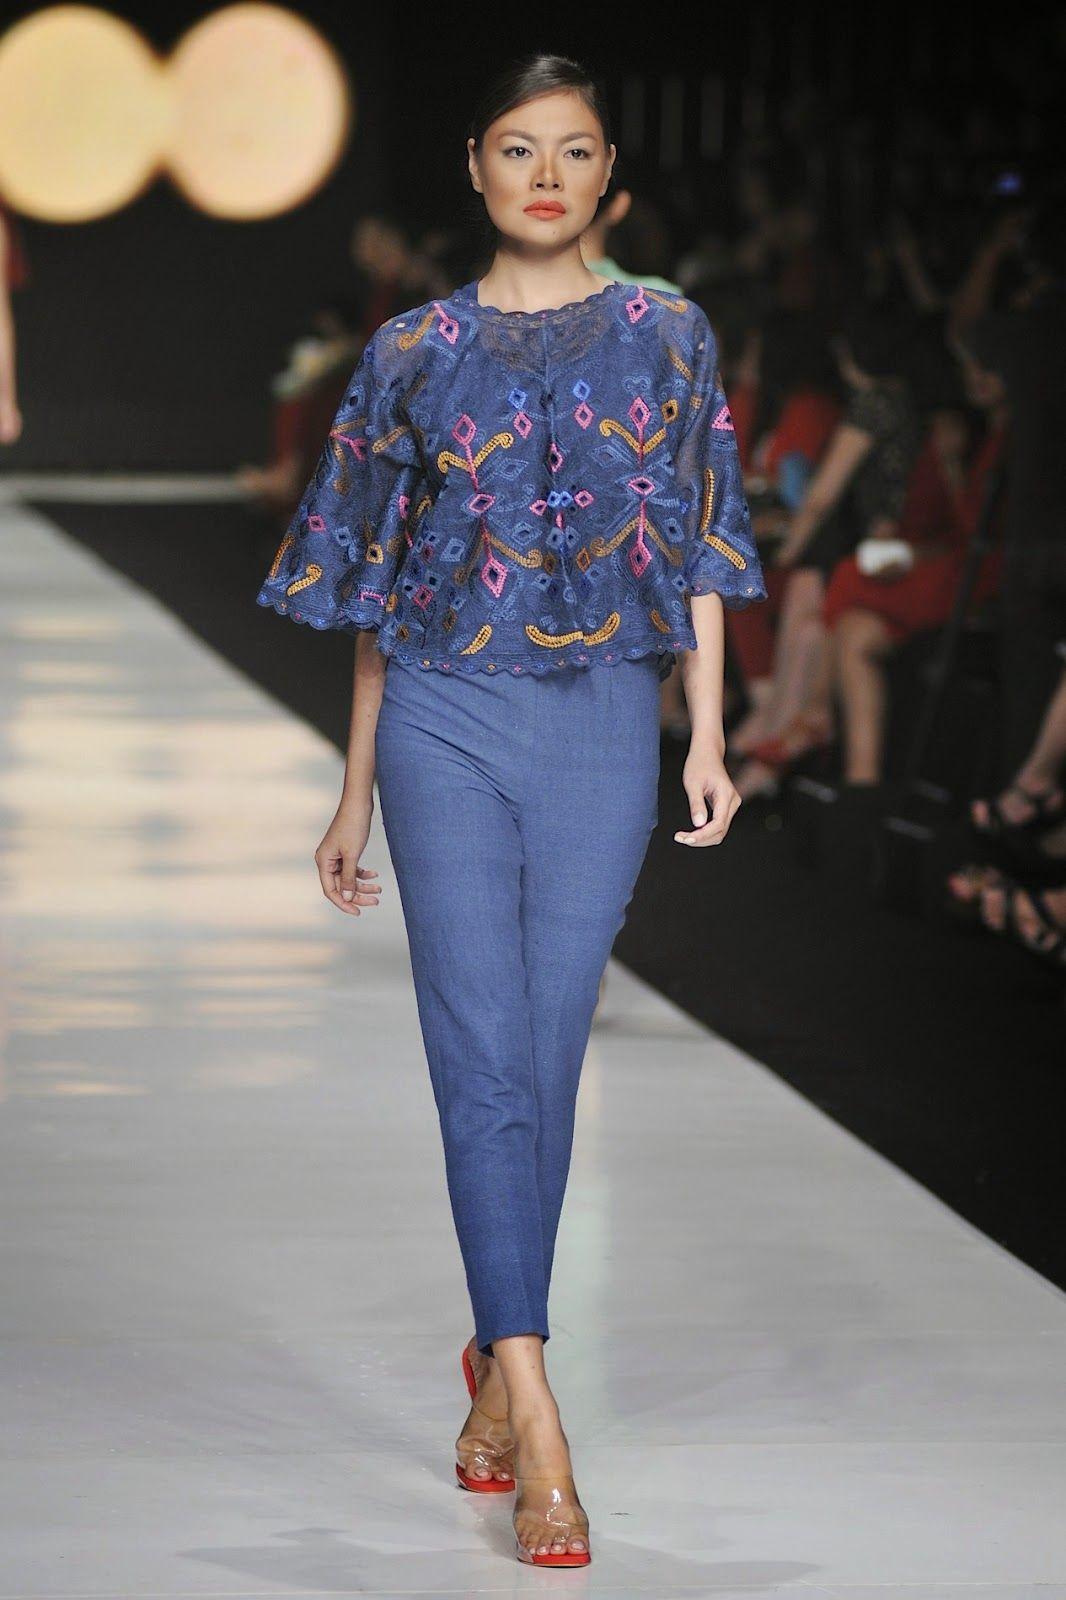 Hello Fashion Designer Terkenal Indonesia Ini Sudah Malang Melintang Selama 13 Tahun Di Dunia Fashion Dan Masih Terus Pakaian Wanita Model Pakaian Gaya Abaya